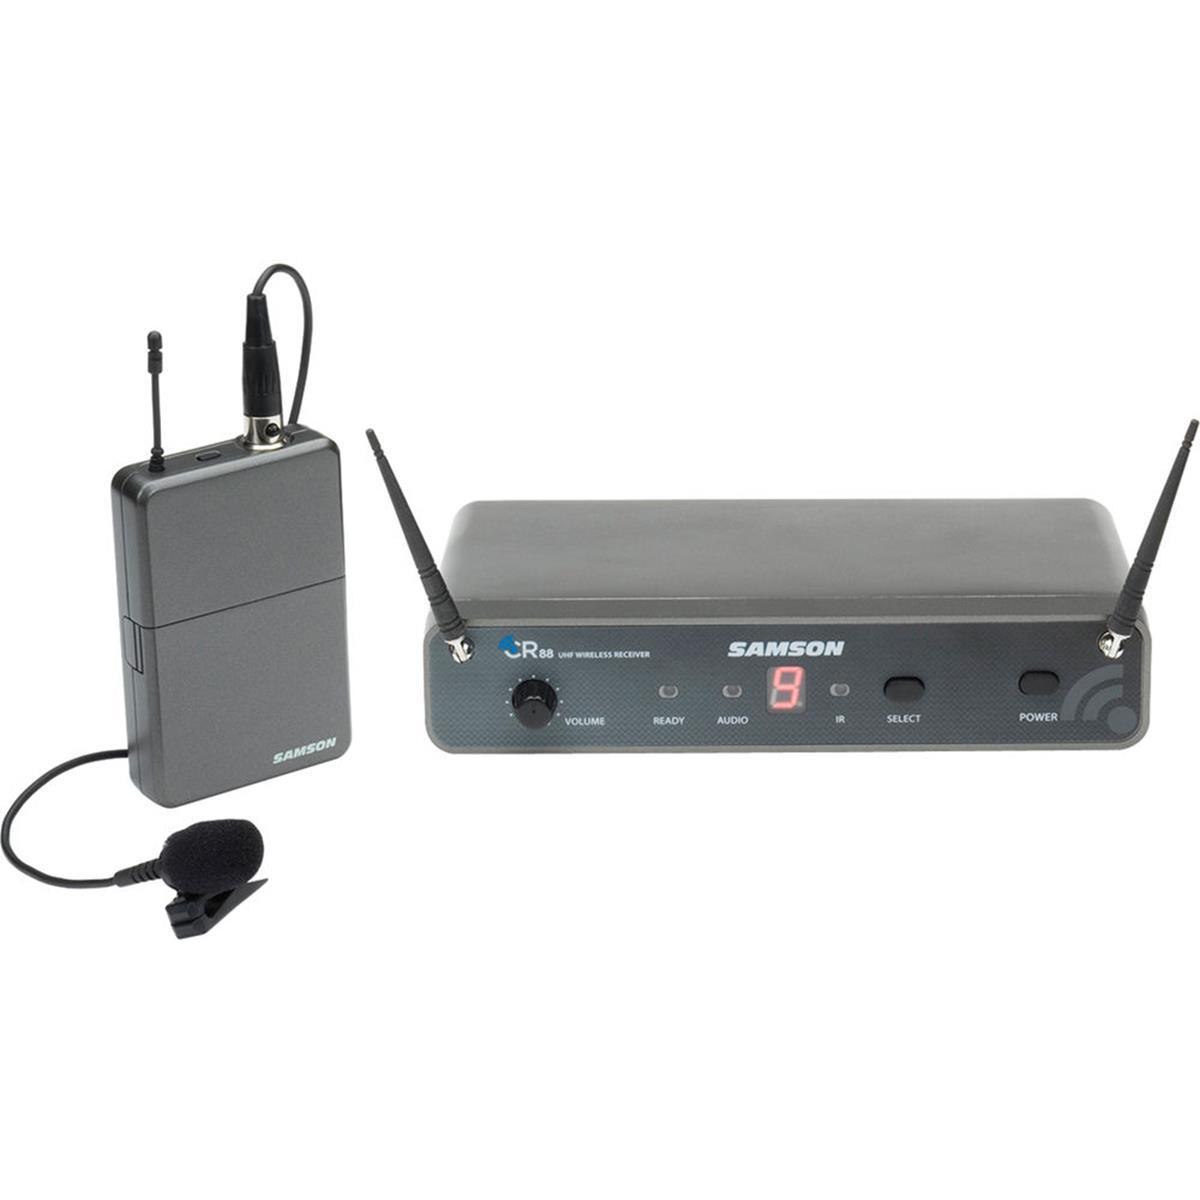 Samson-SYNTH-7-UHF-Lavalier-System-I-518-546-9MHz-sku-7649290652004